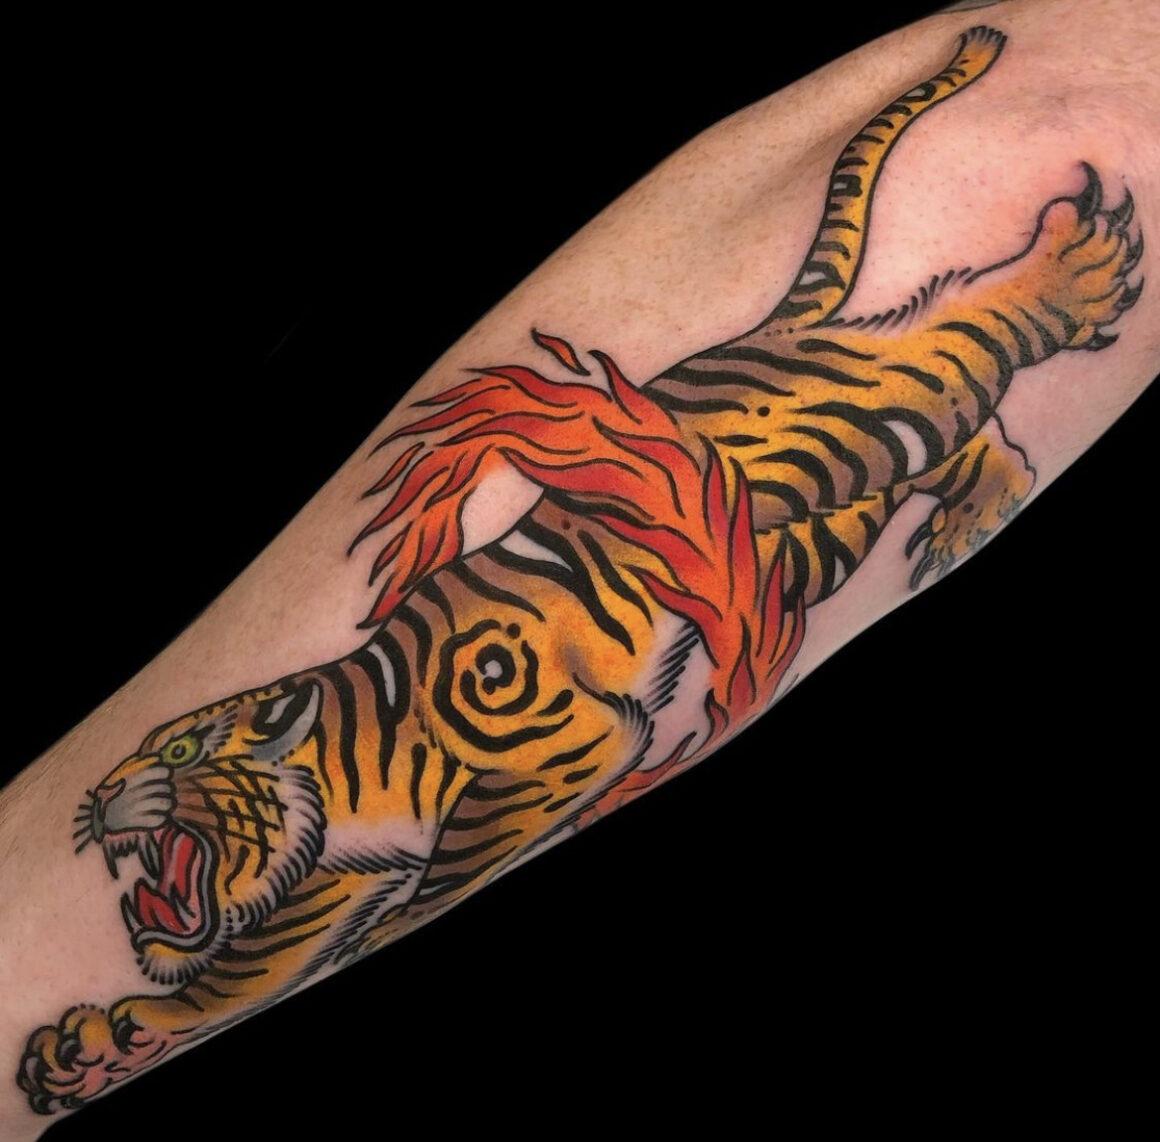 Andy Reach, Redemption Tattoo, Cambridge, USA